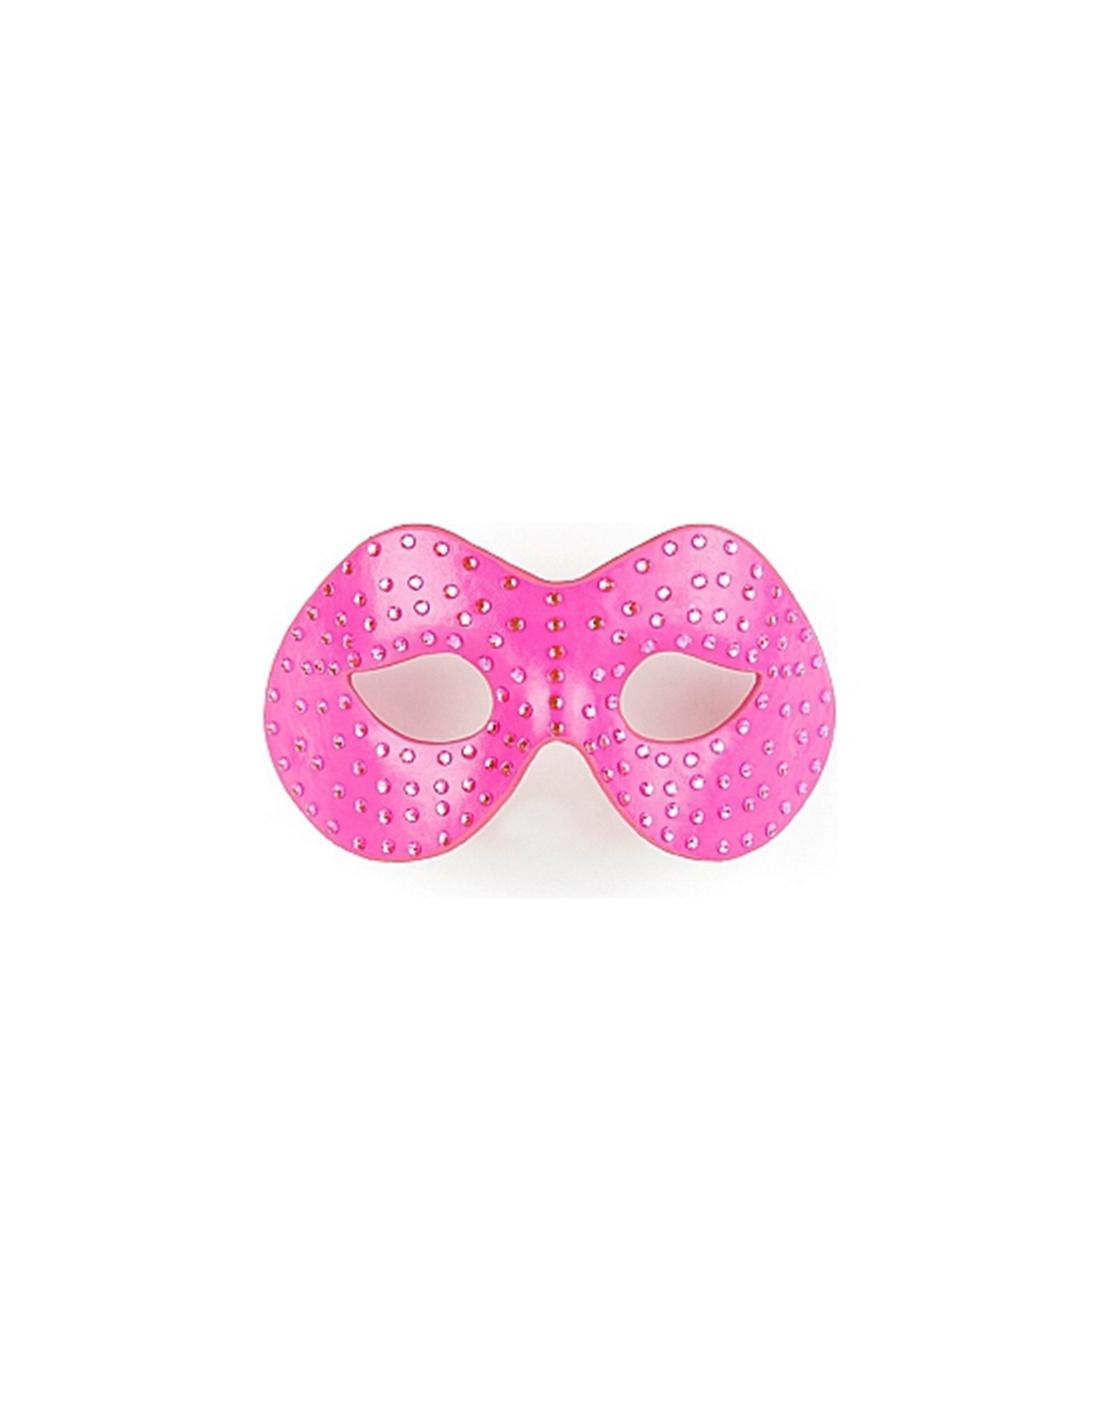 Máscara Ouch! Diamond Moulded Rosa - PR2010323177